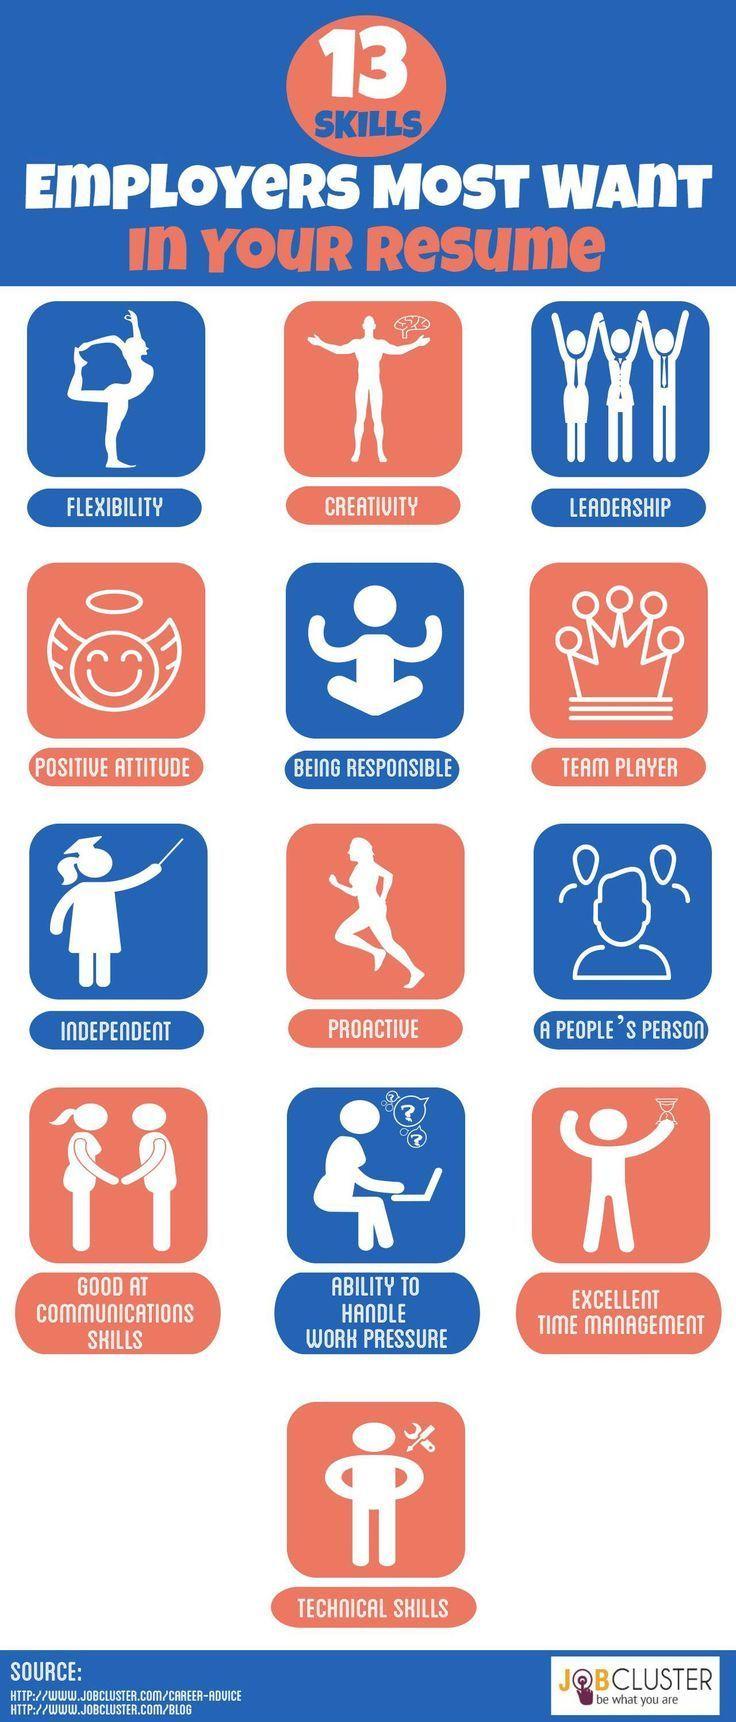 13 Most Important #Resume Skills www.jobcluster.com/